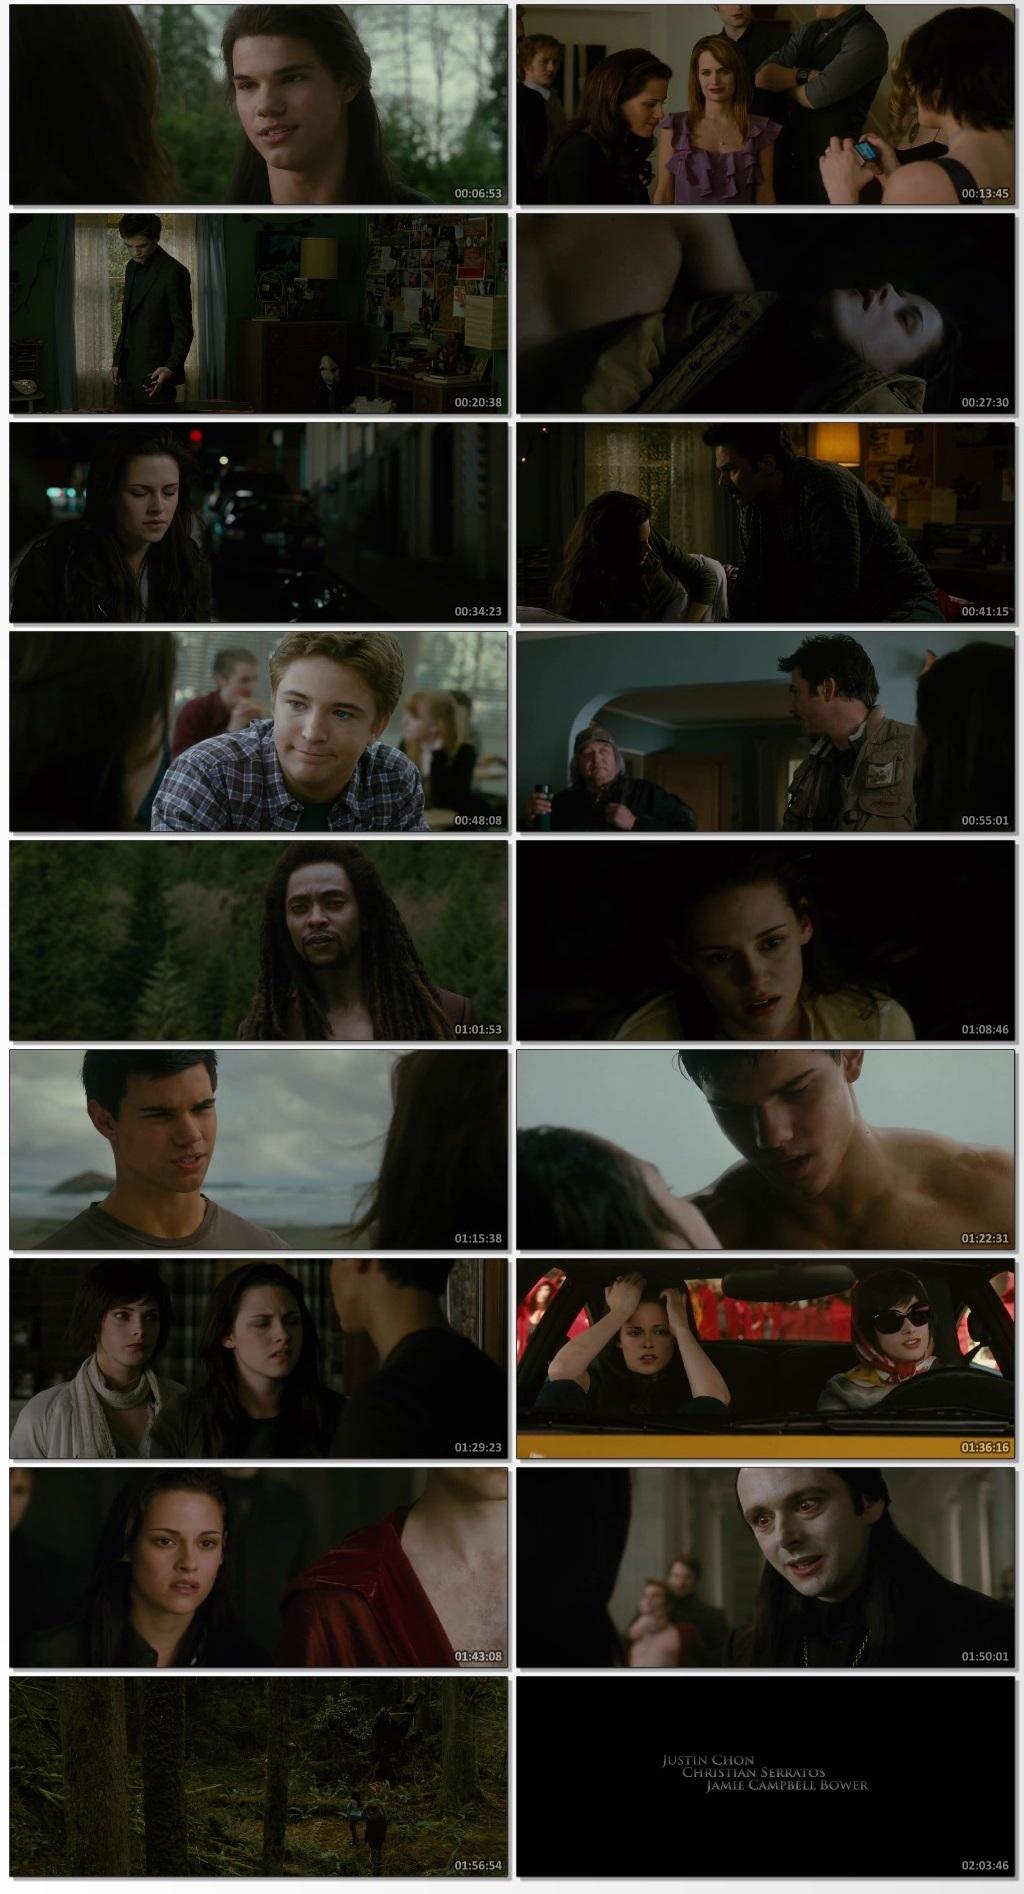 The-Twilight-Saga-New-Moon-2009-English-720p-www-7-Star-HD-Page-Blu-Ray-ESub-850-MB-1-mkv-thumbs